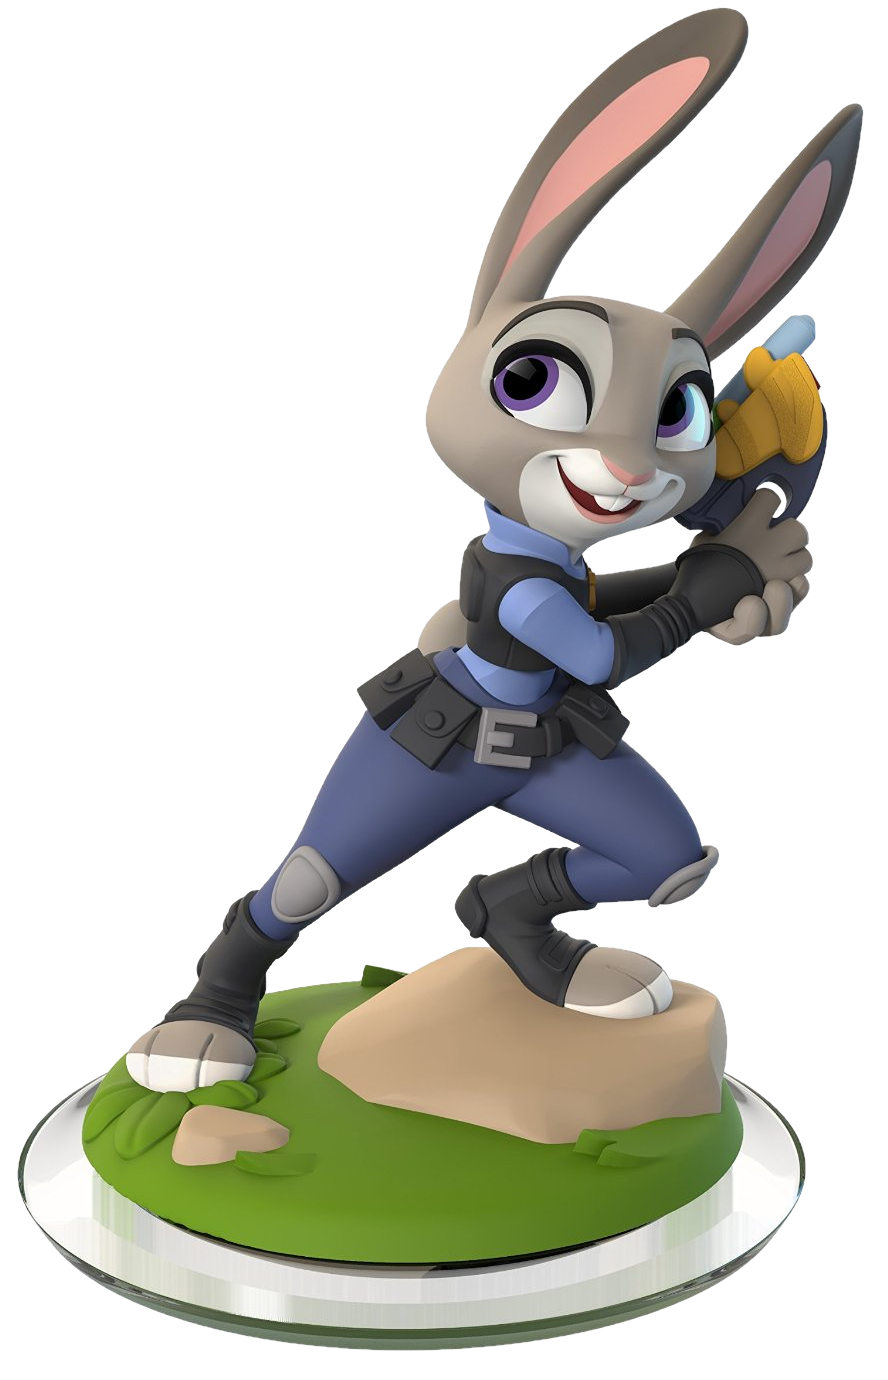 Wreck it ralph disney infinity wiki fandom powered by - Judy Disney Infinity Figure Png